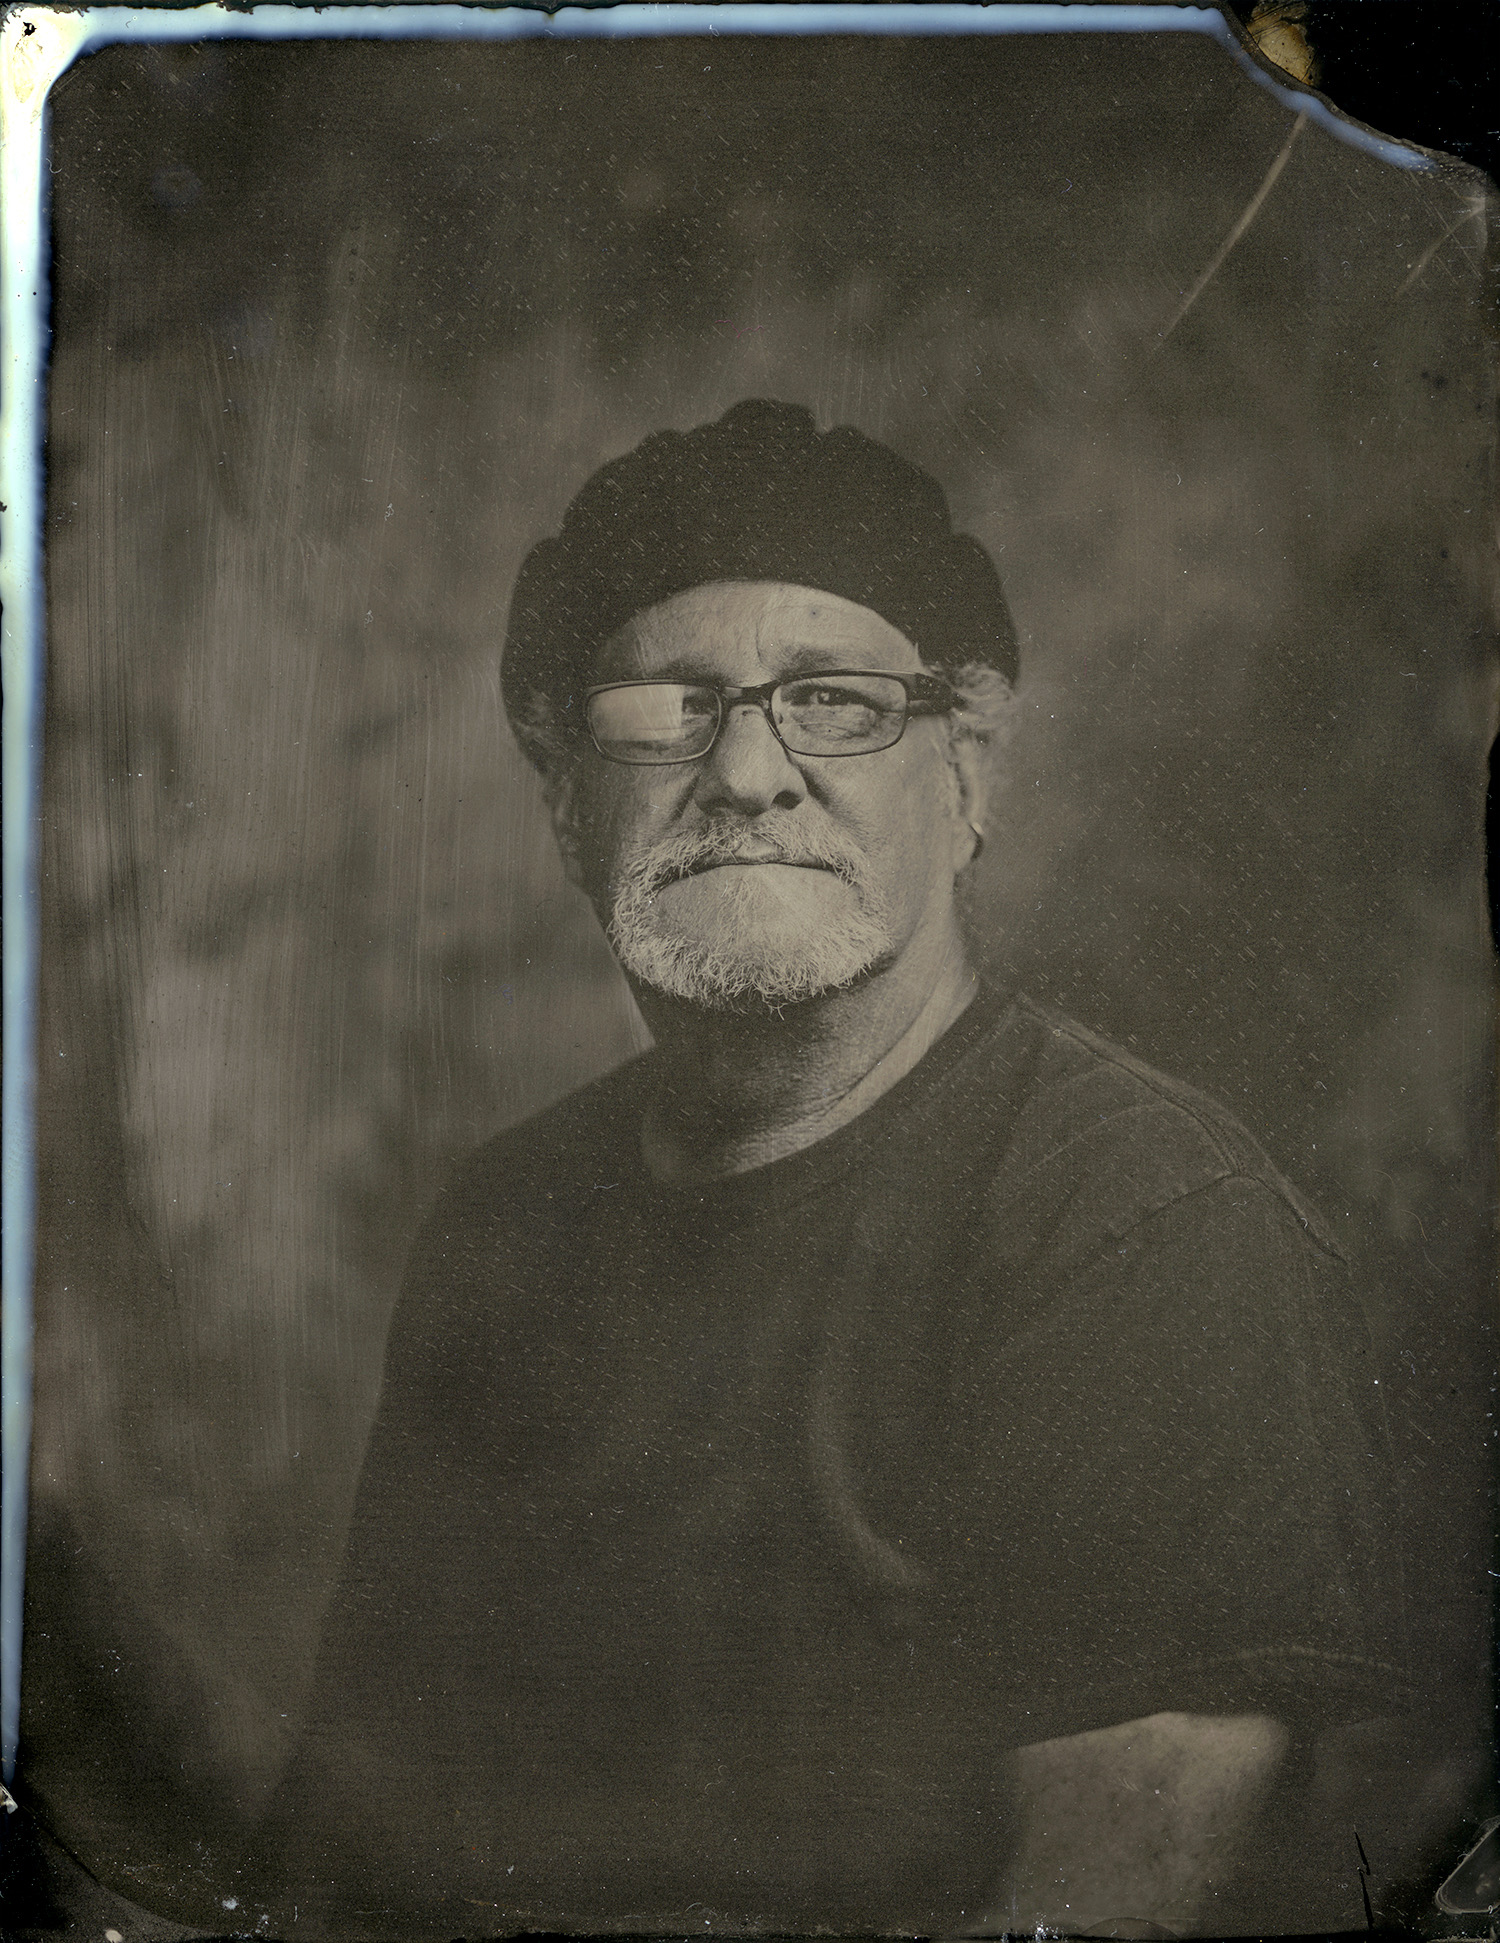 Tintype of Ray Bidegain created by Ashley Jennings.